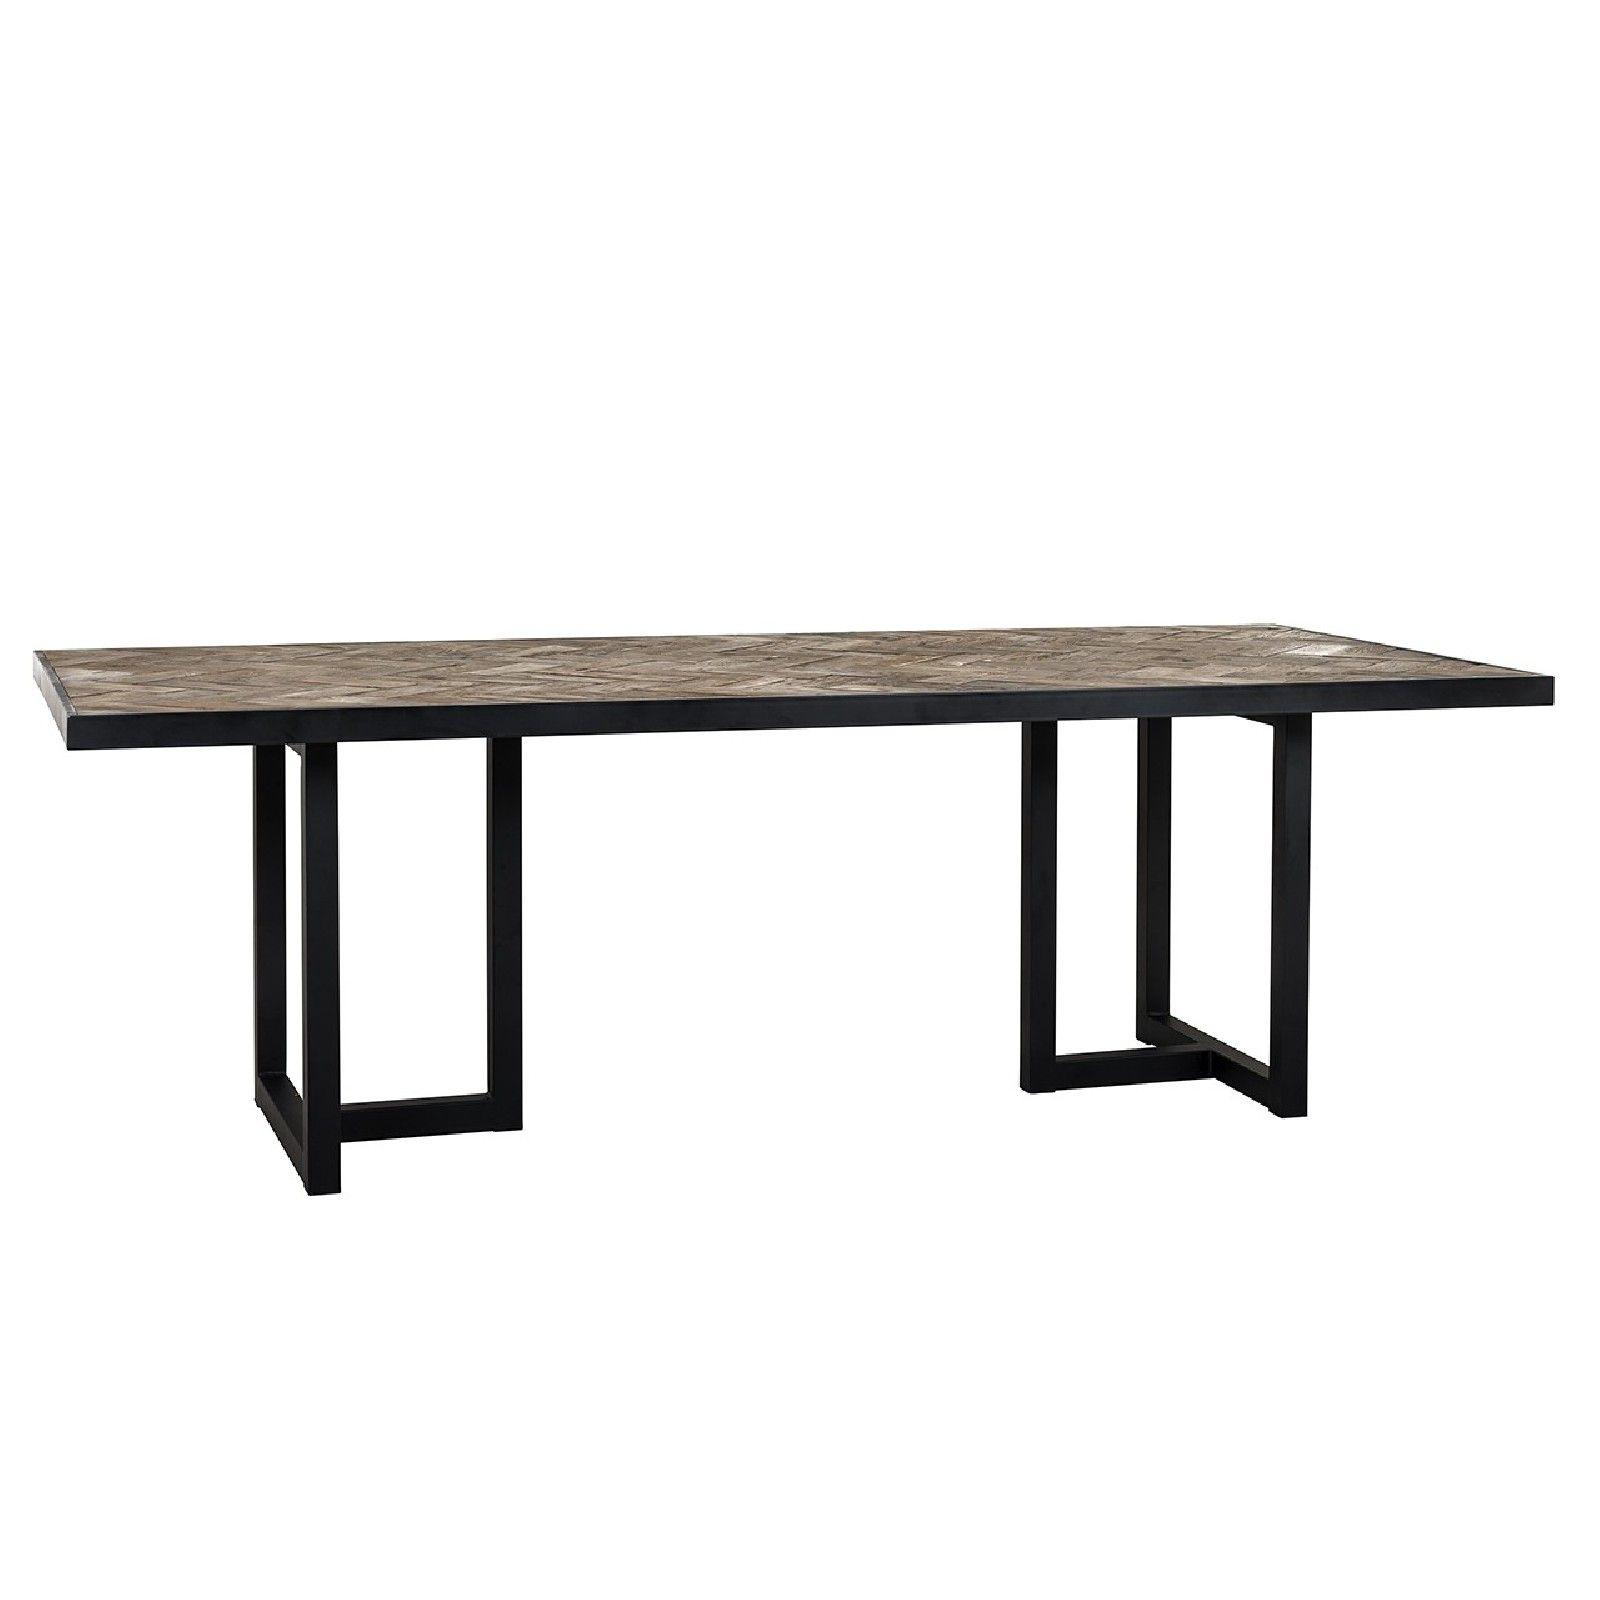 Table à dîner Herringbone 240 Meuble Déco Tendance - 194